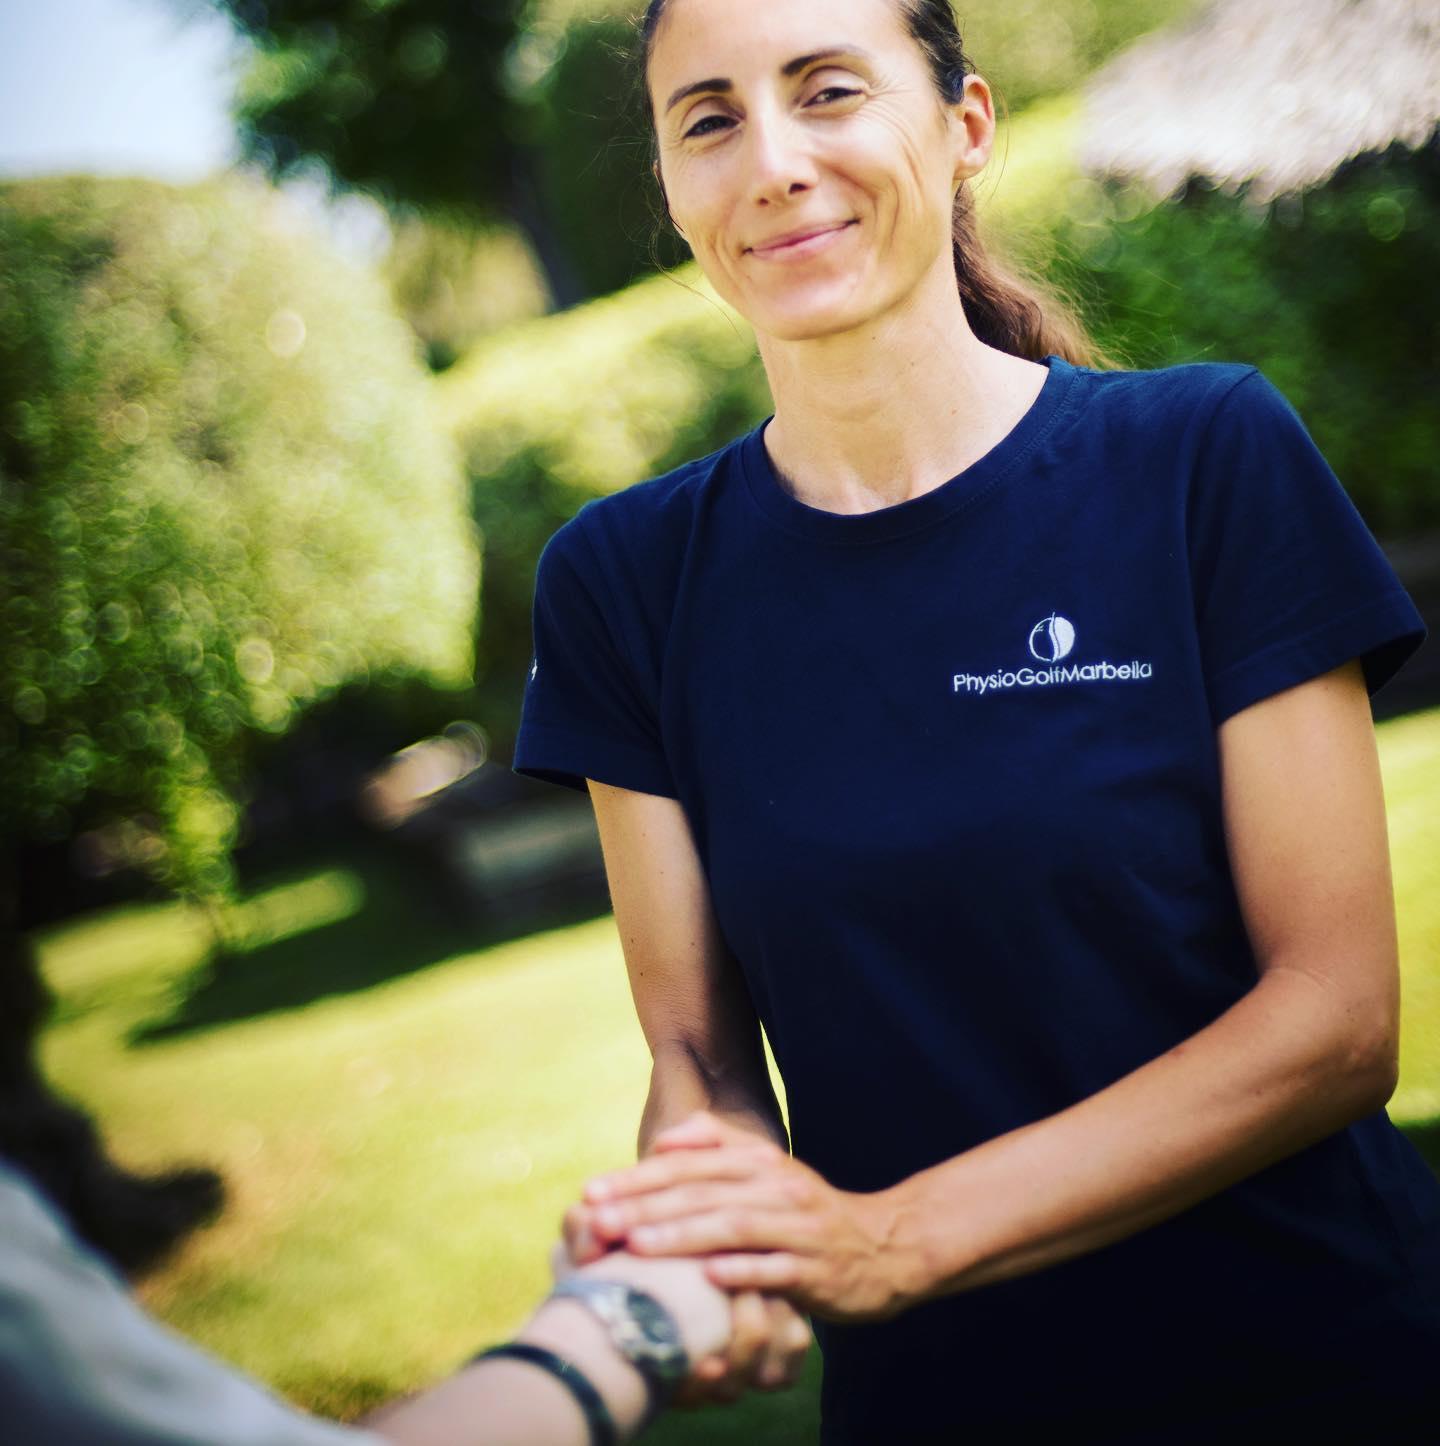 Chiara Cantone - Golf and Sports Physiotherapist - Bodyworks Clinic Marbella